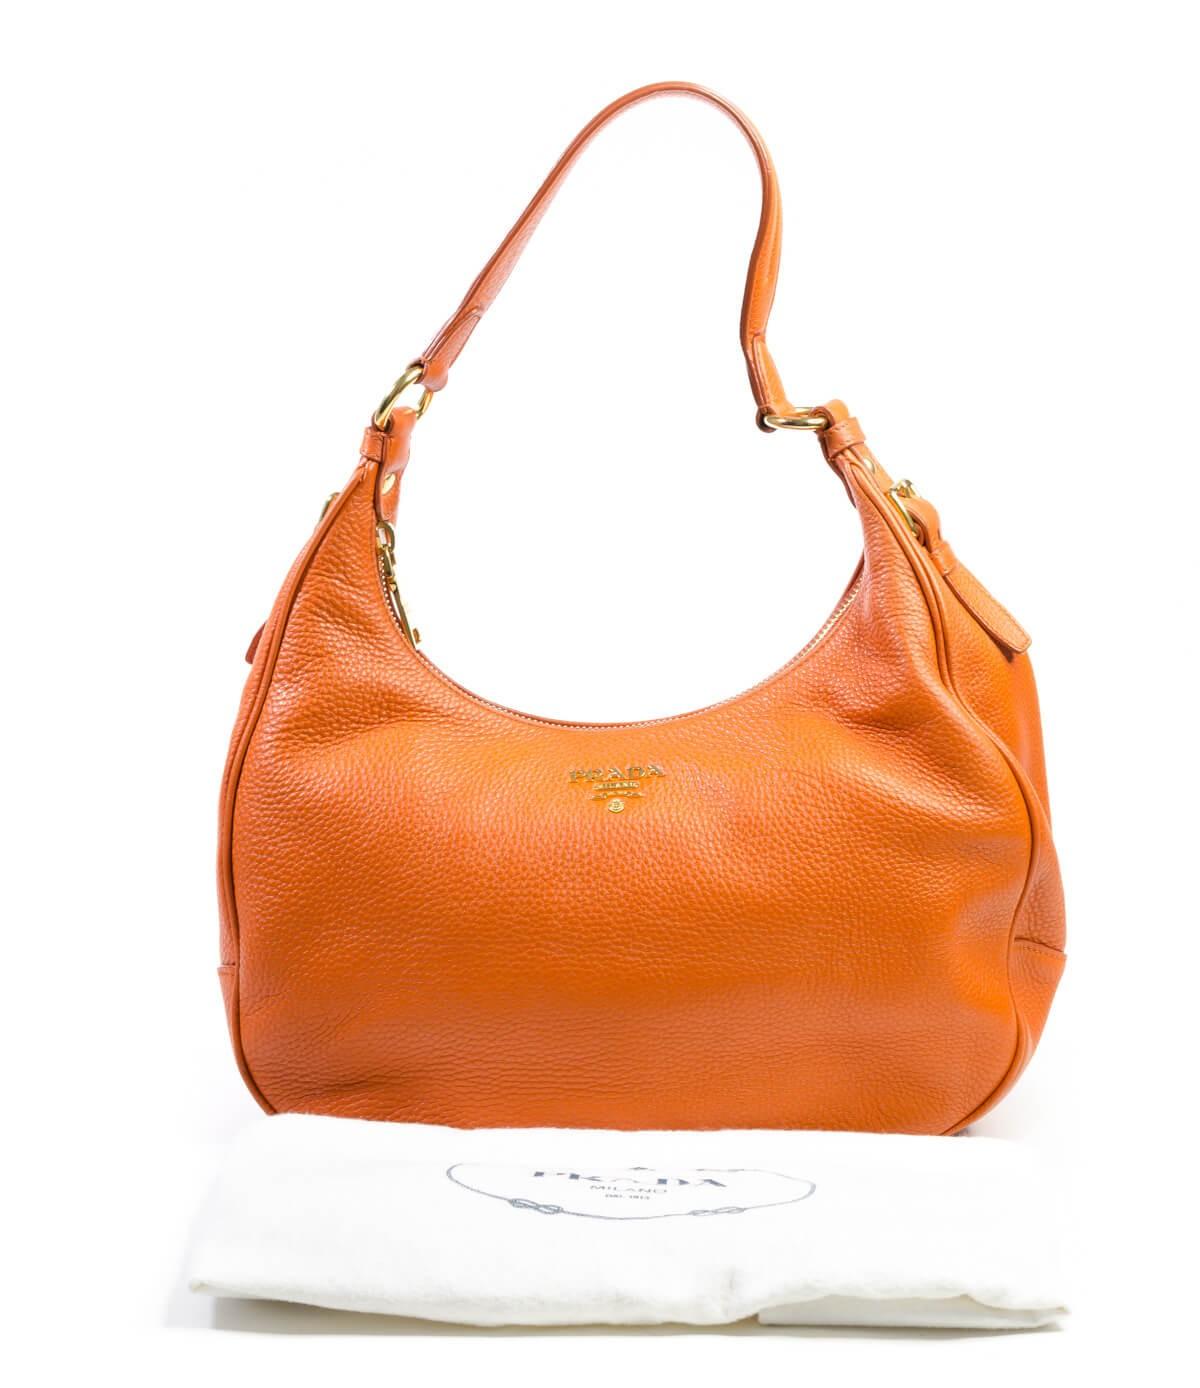 8cbf1410426 Prada. Vitello Daino Leather Zip-Top Hobo Bag